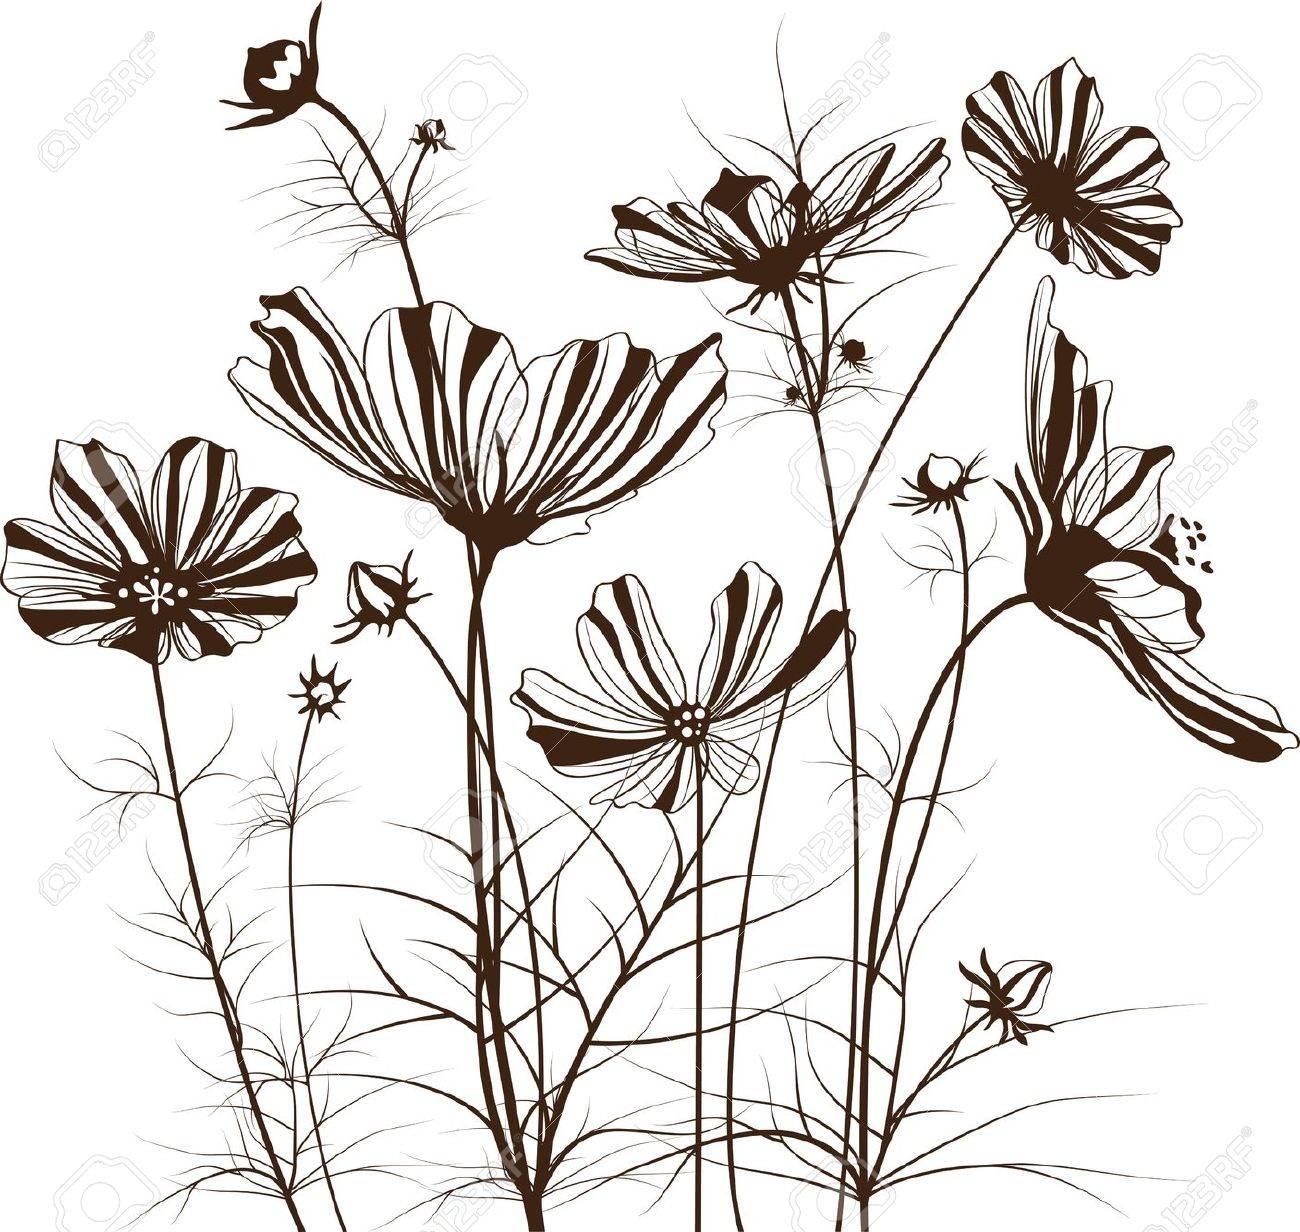 garden flowers, Cosmos bipinnatus - 15071814